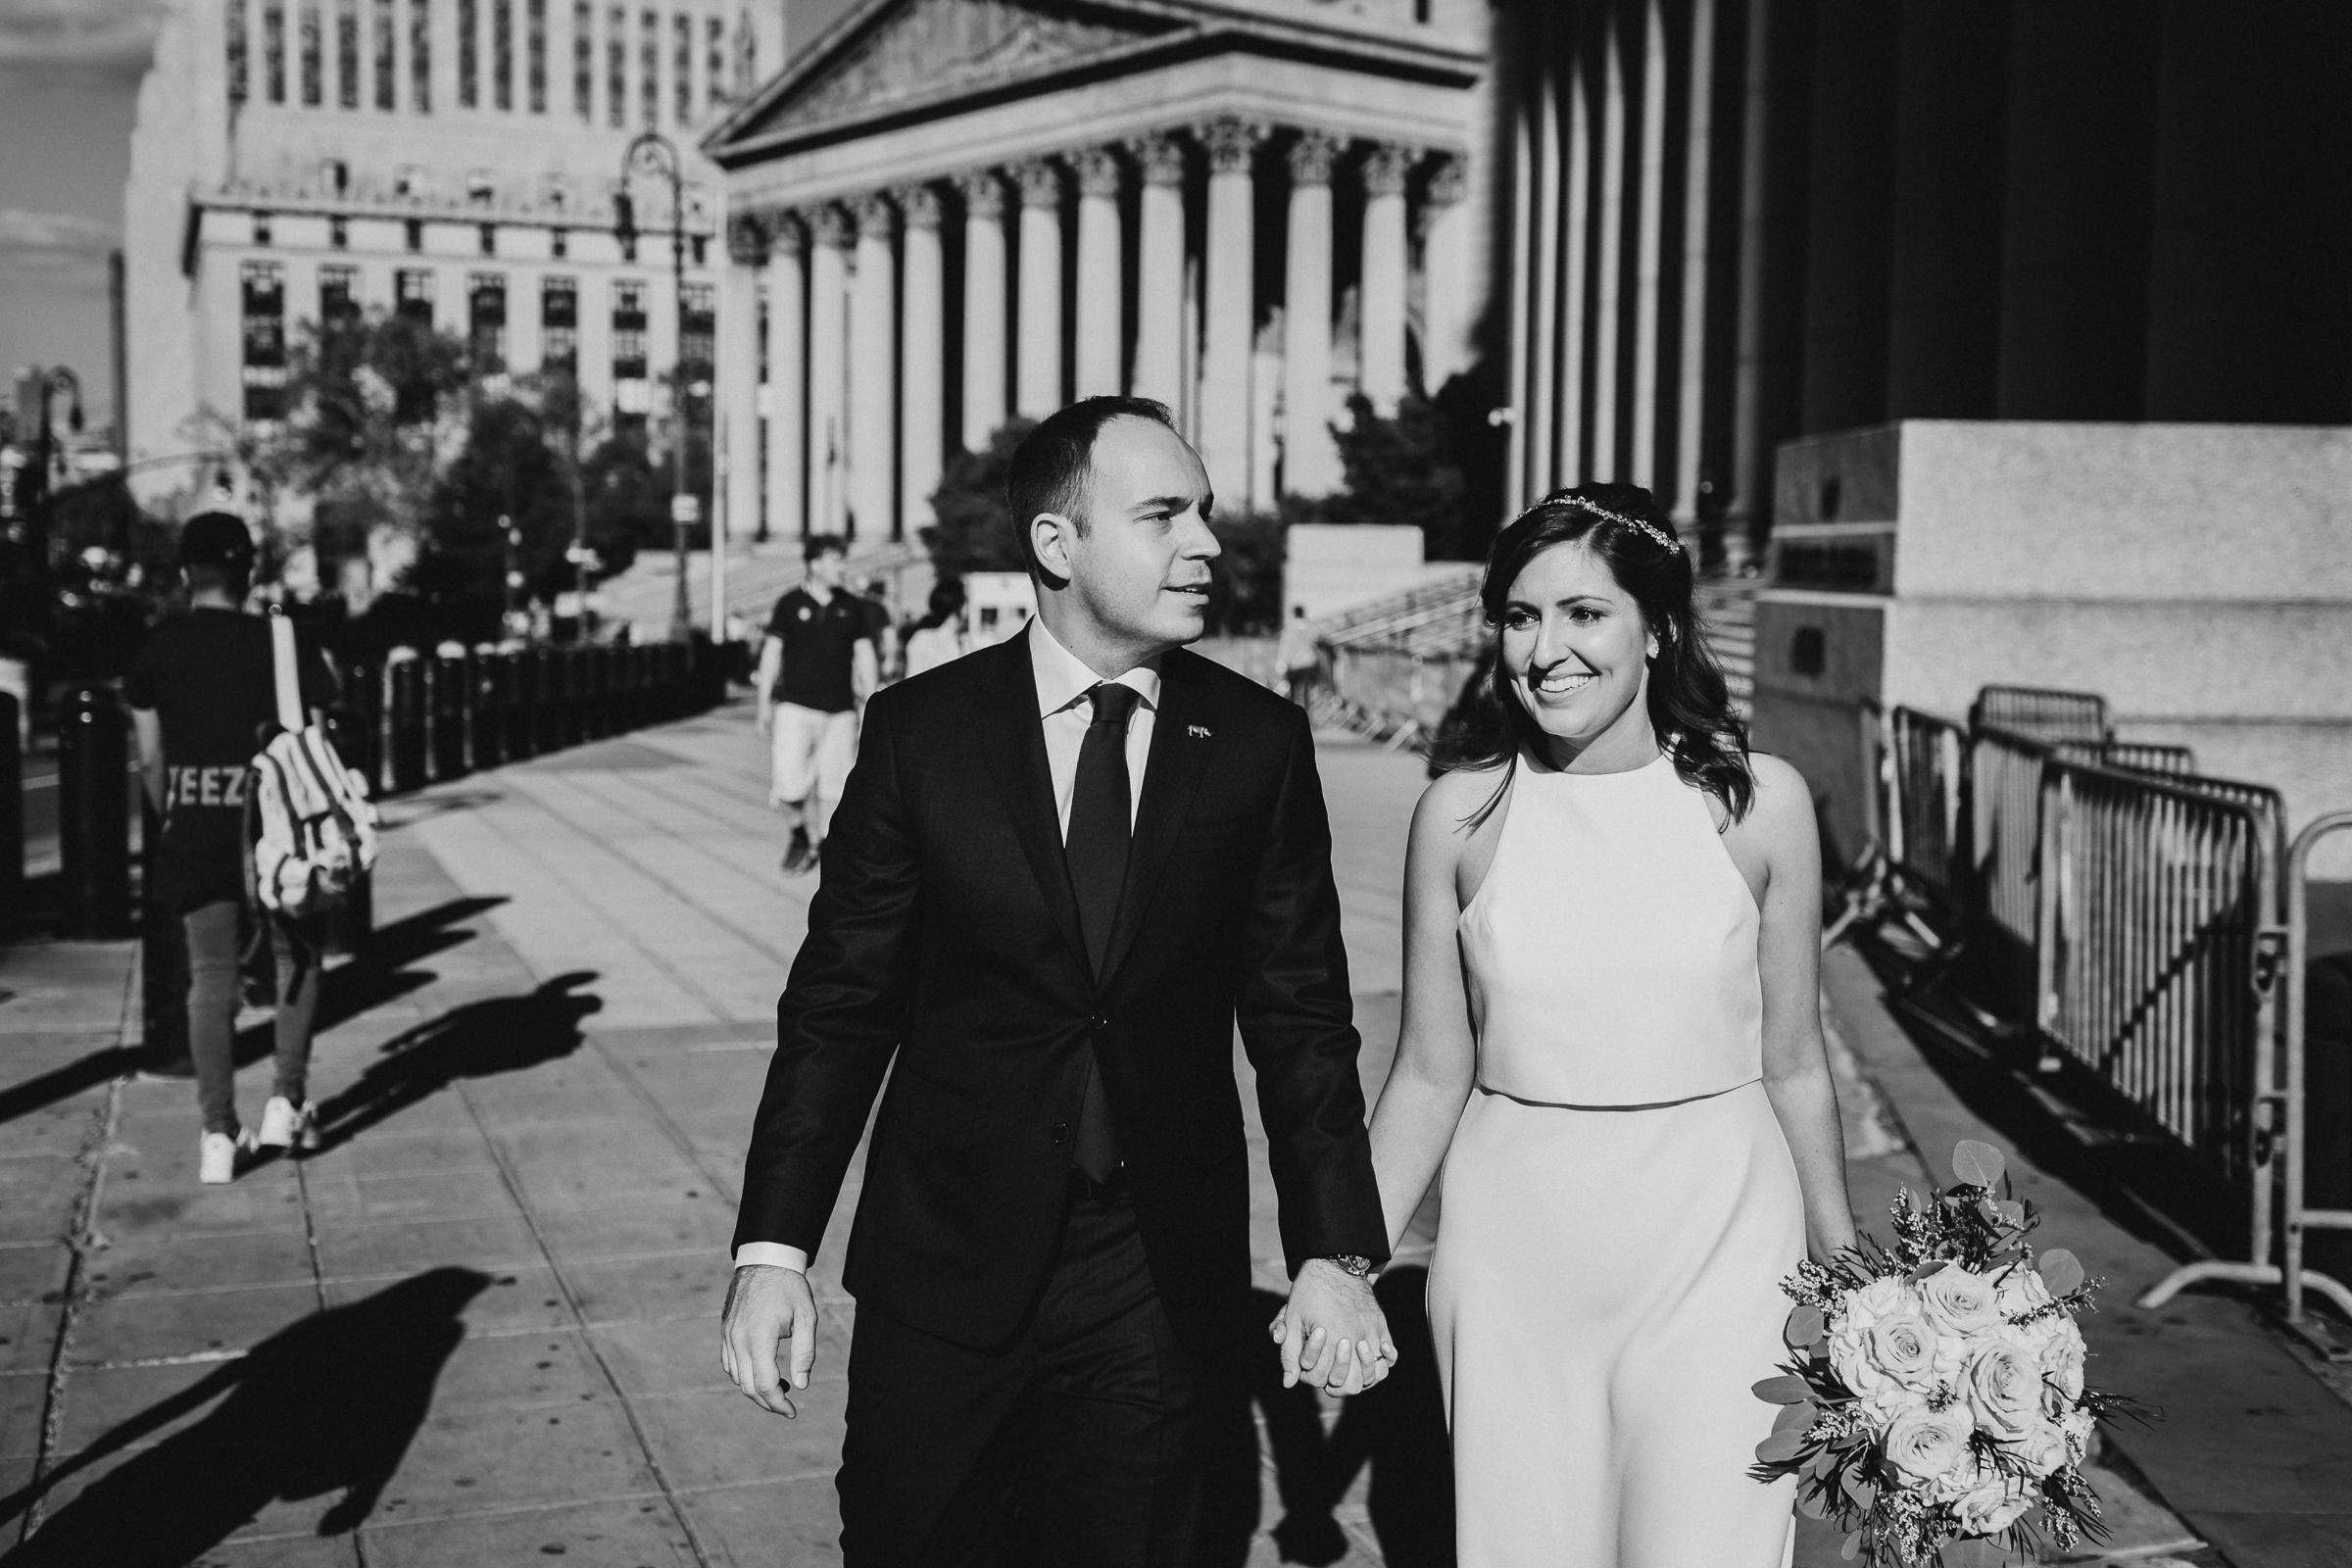 Casa-Apicii-Intimate-Wedding-City-Hall-Elopement-New-York-Documentary-Wedding-Photographer-17.jpg